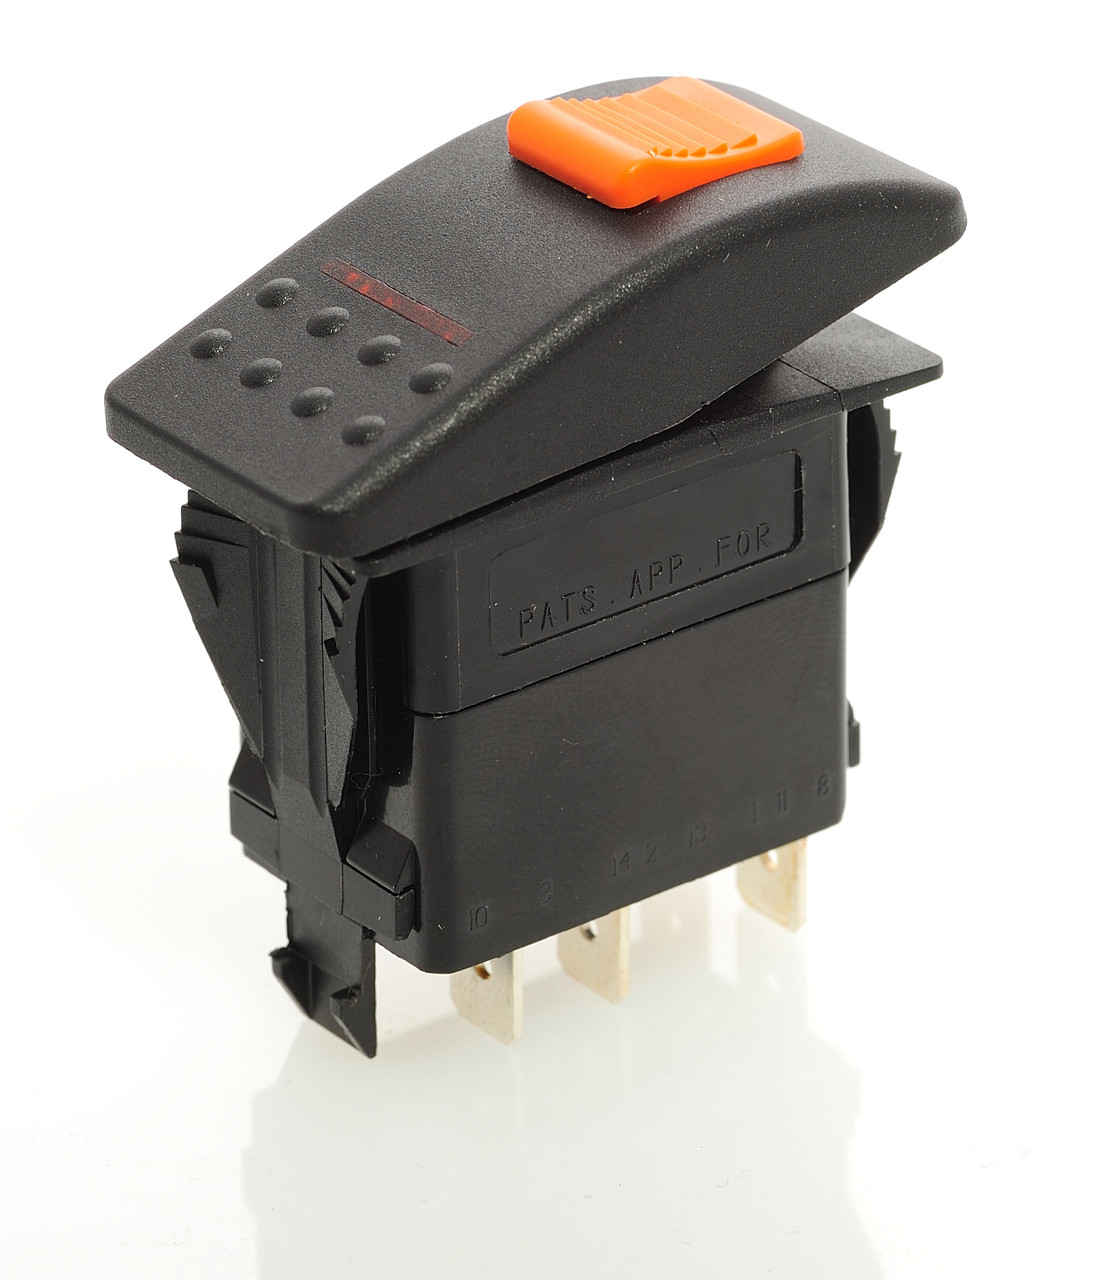 Light Pole Nut Covers: Locking Rocker Switch, Carling V1D2HW6B-ADE00-000